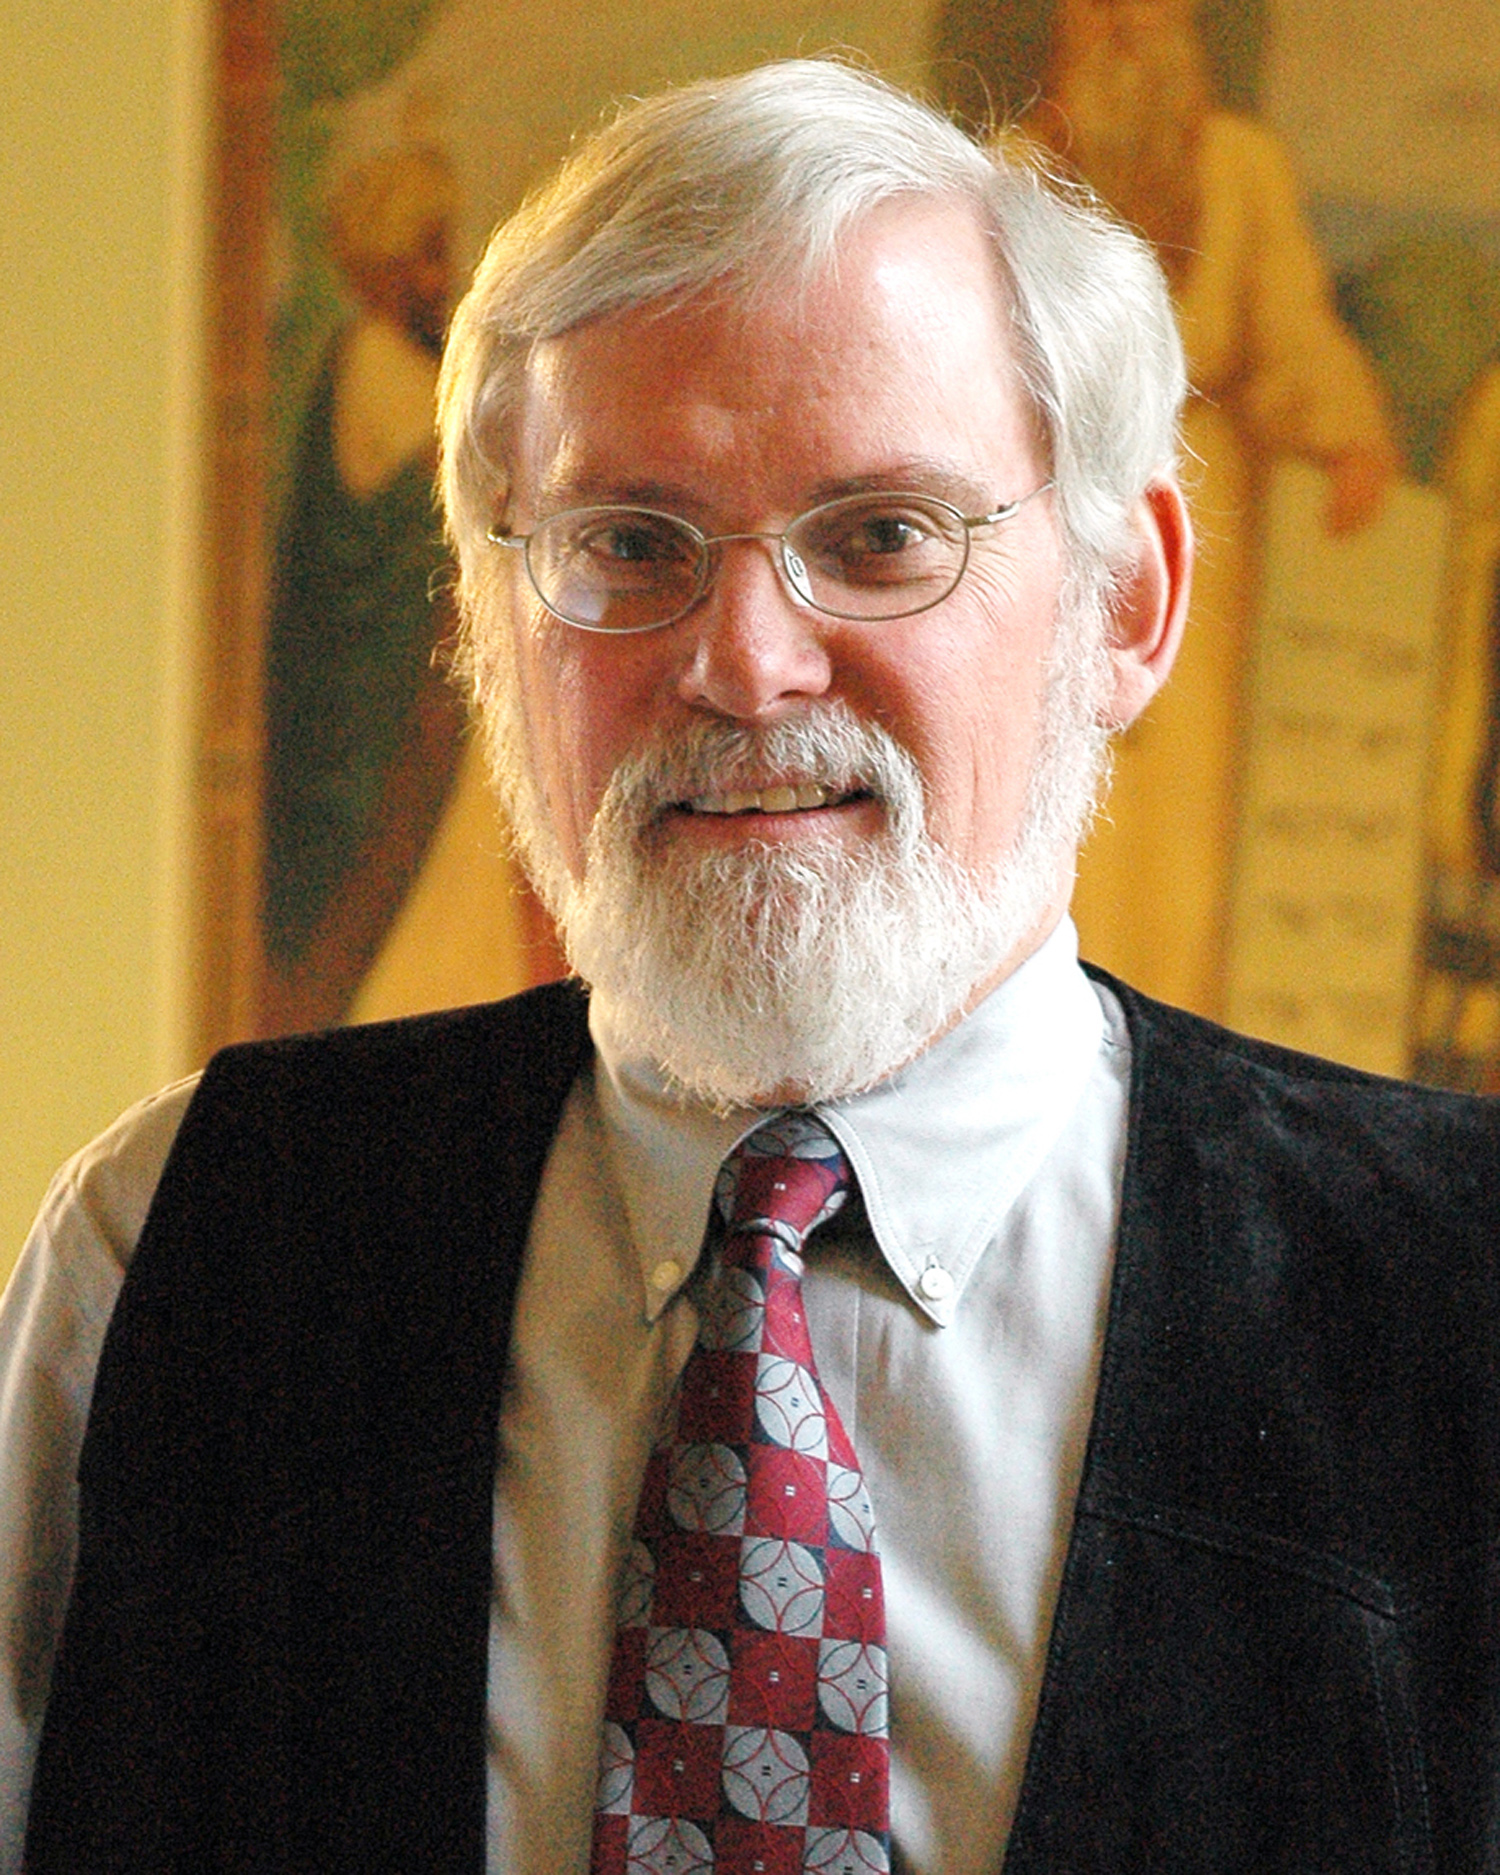 New University of Utah President Dr. David W. Pershing.